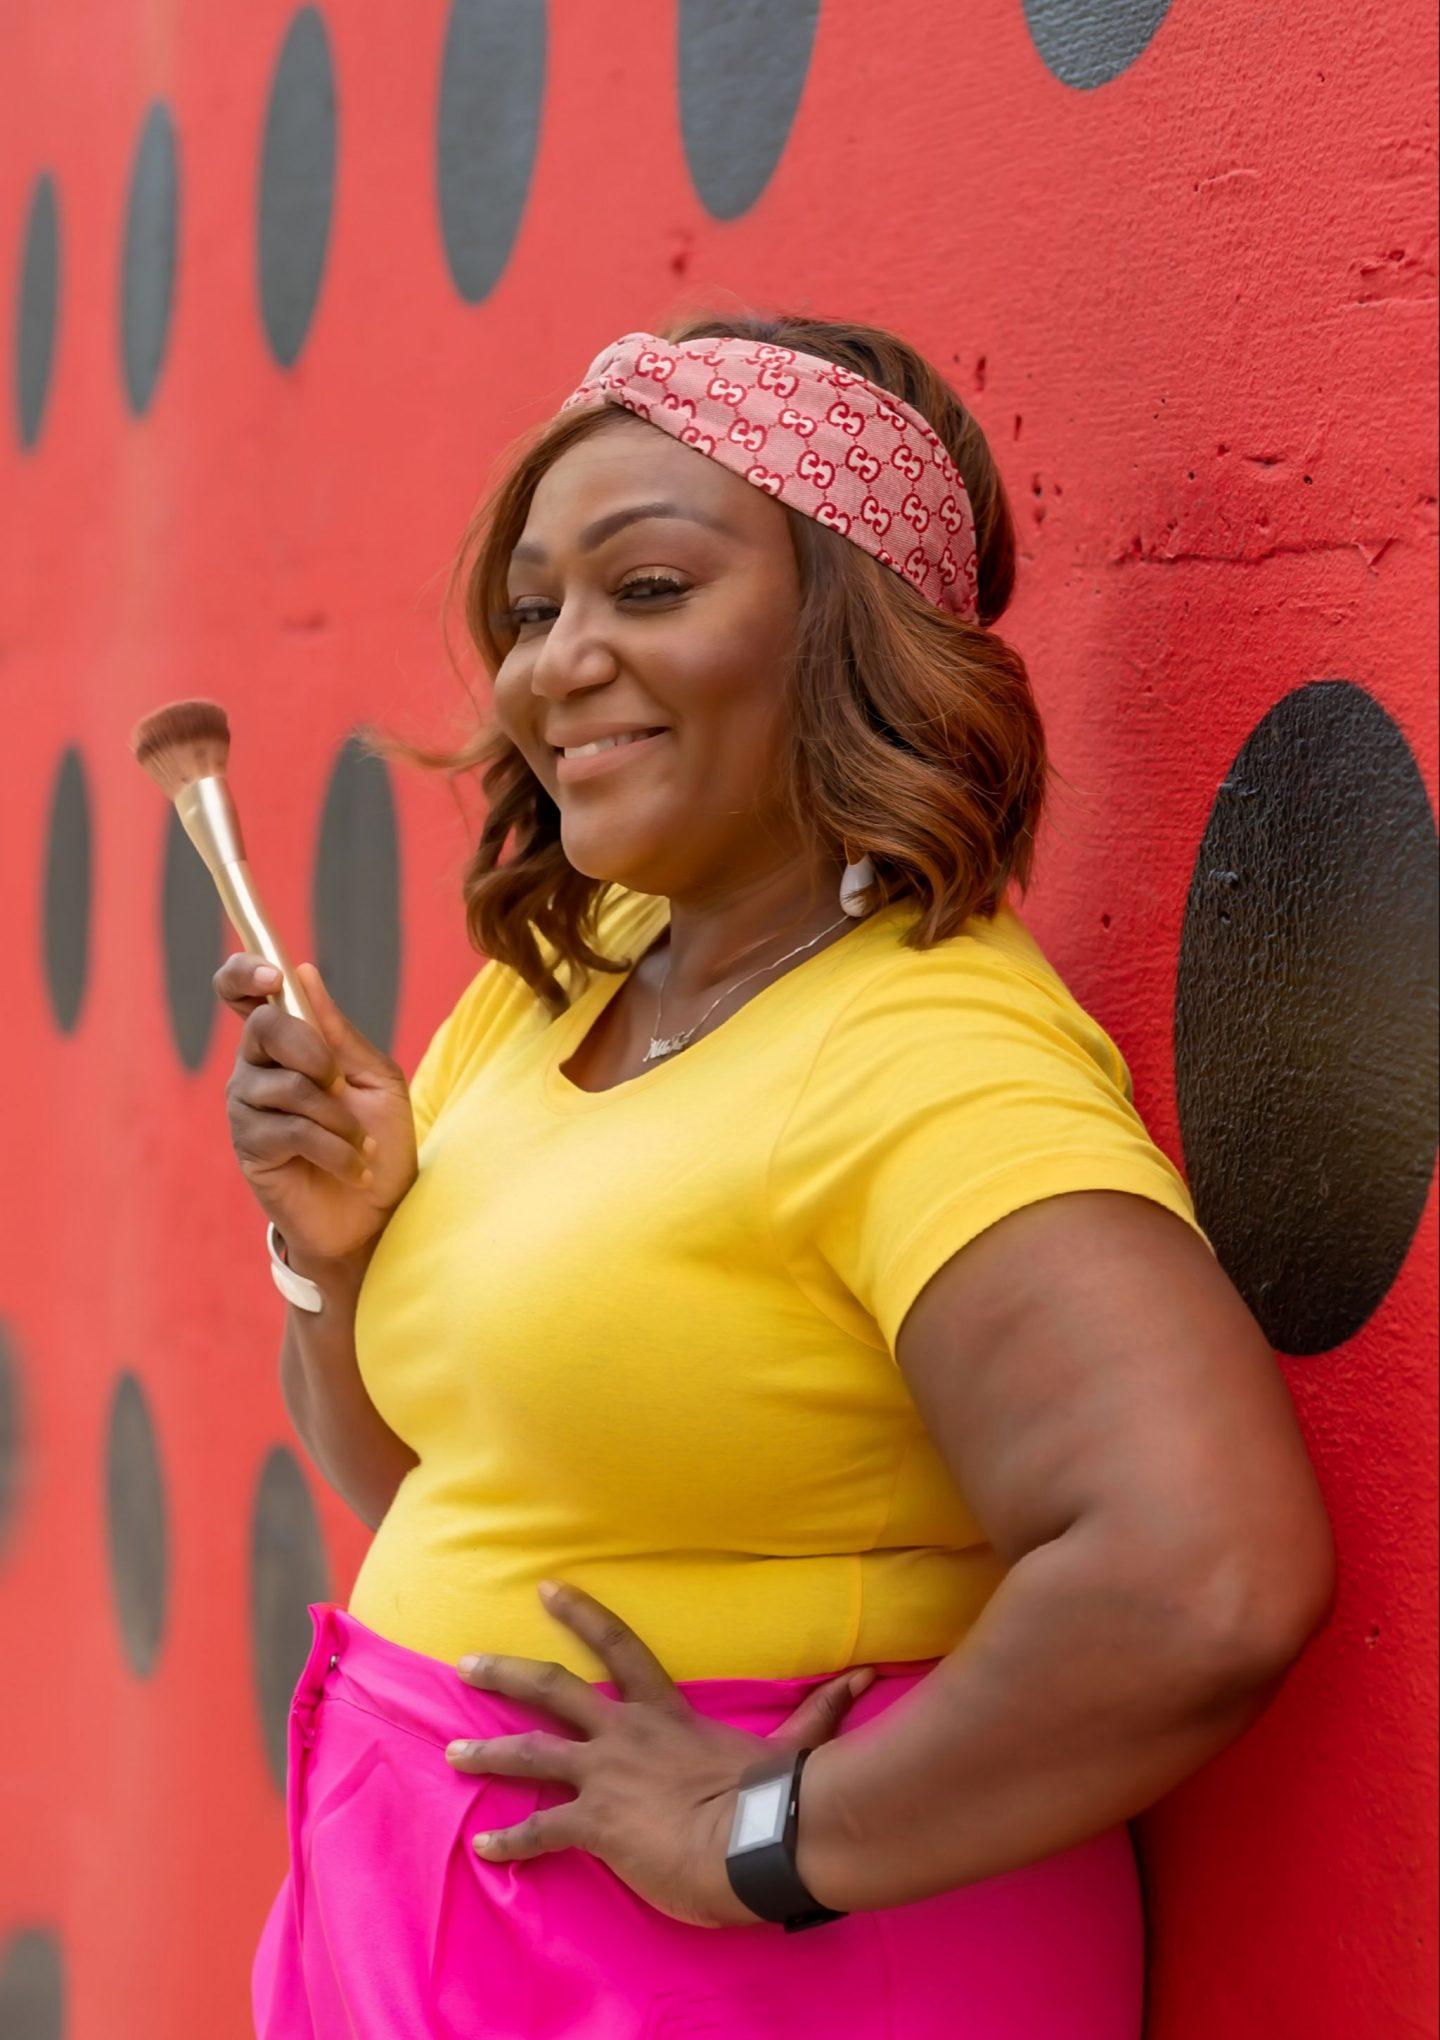 Influencer Nikki Free holding angled makeup brush